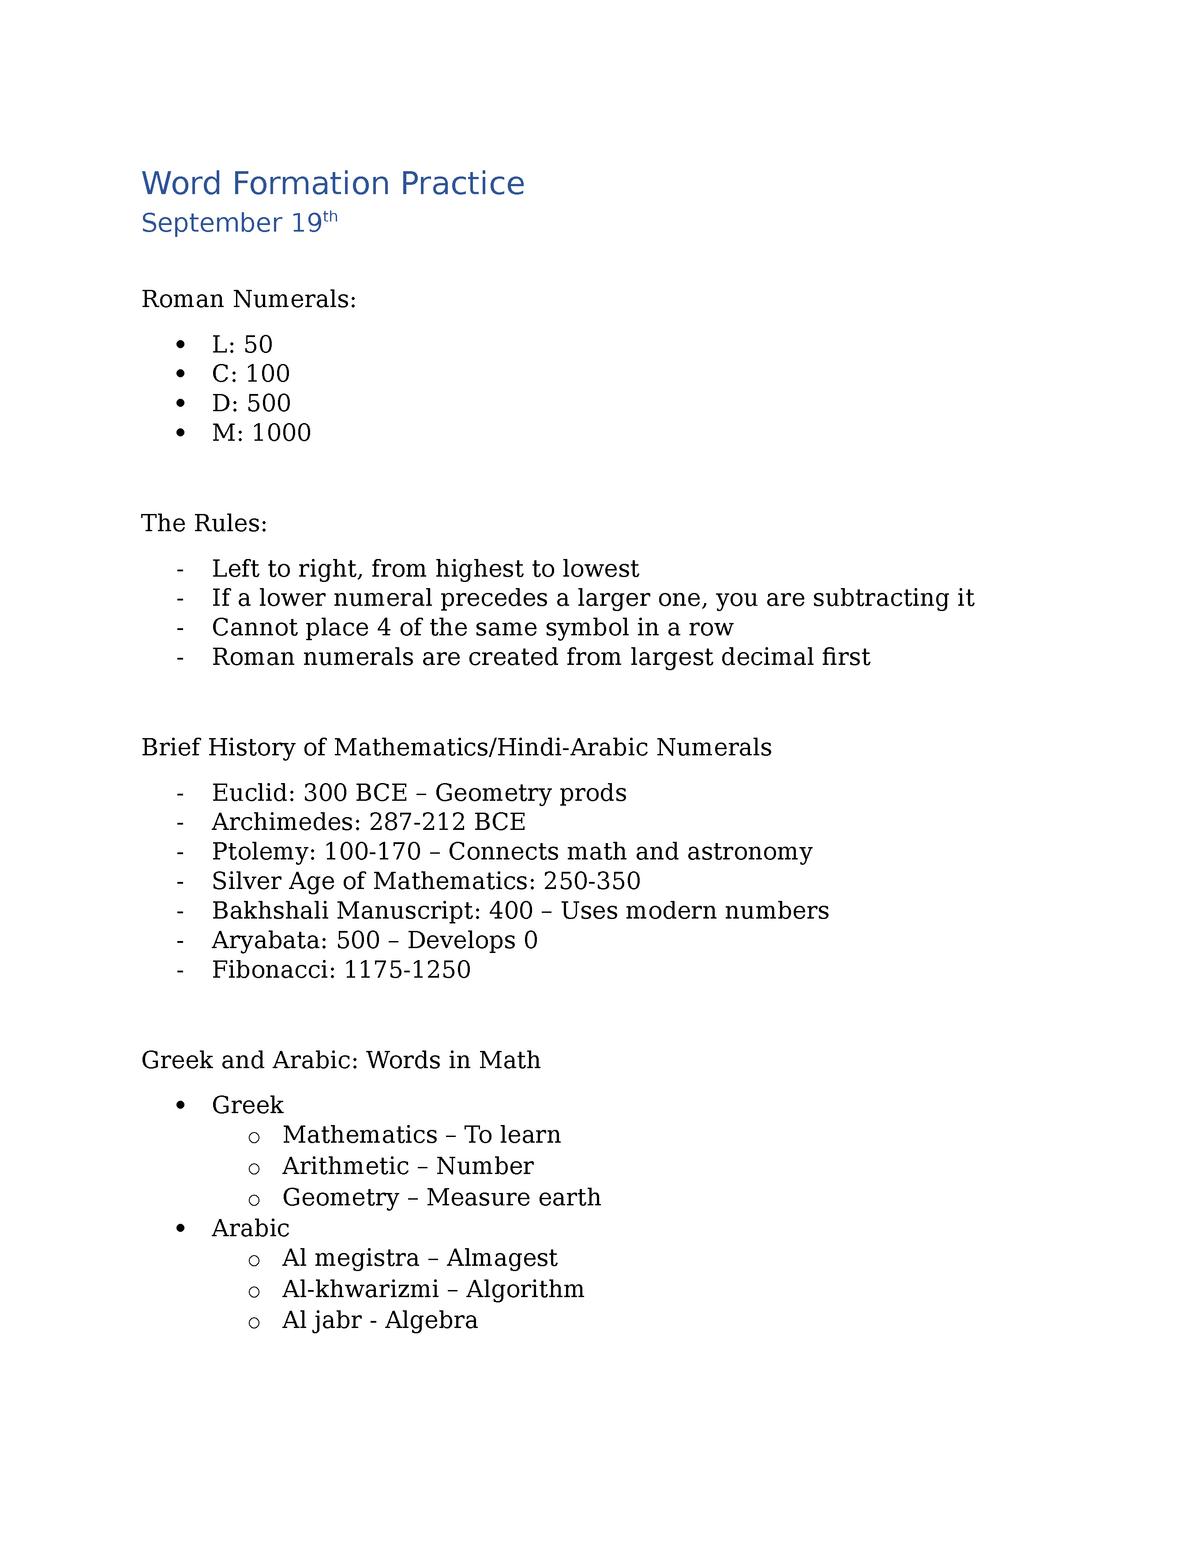 Classics 225 Lecture 8 - L08 225D: Latin & Greek In Current English